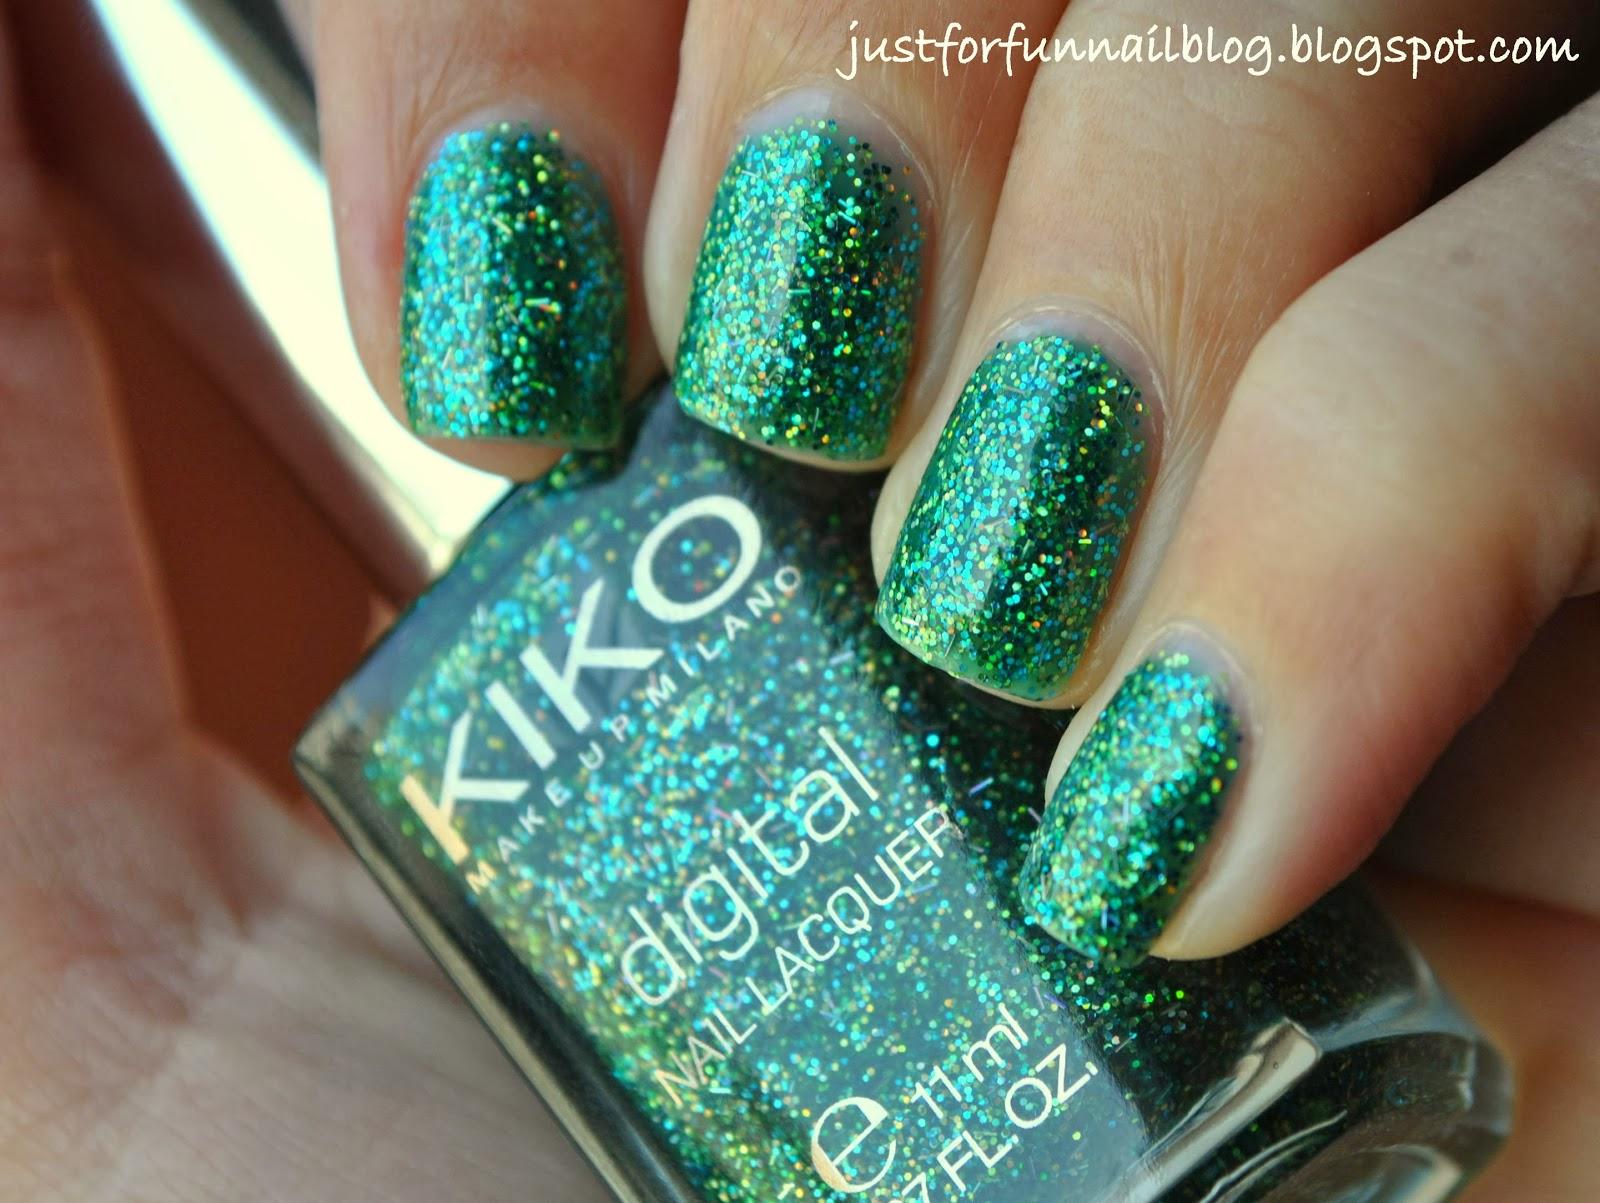 KIKO 441 Illusion Green